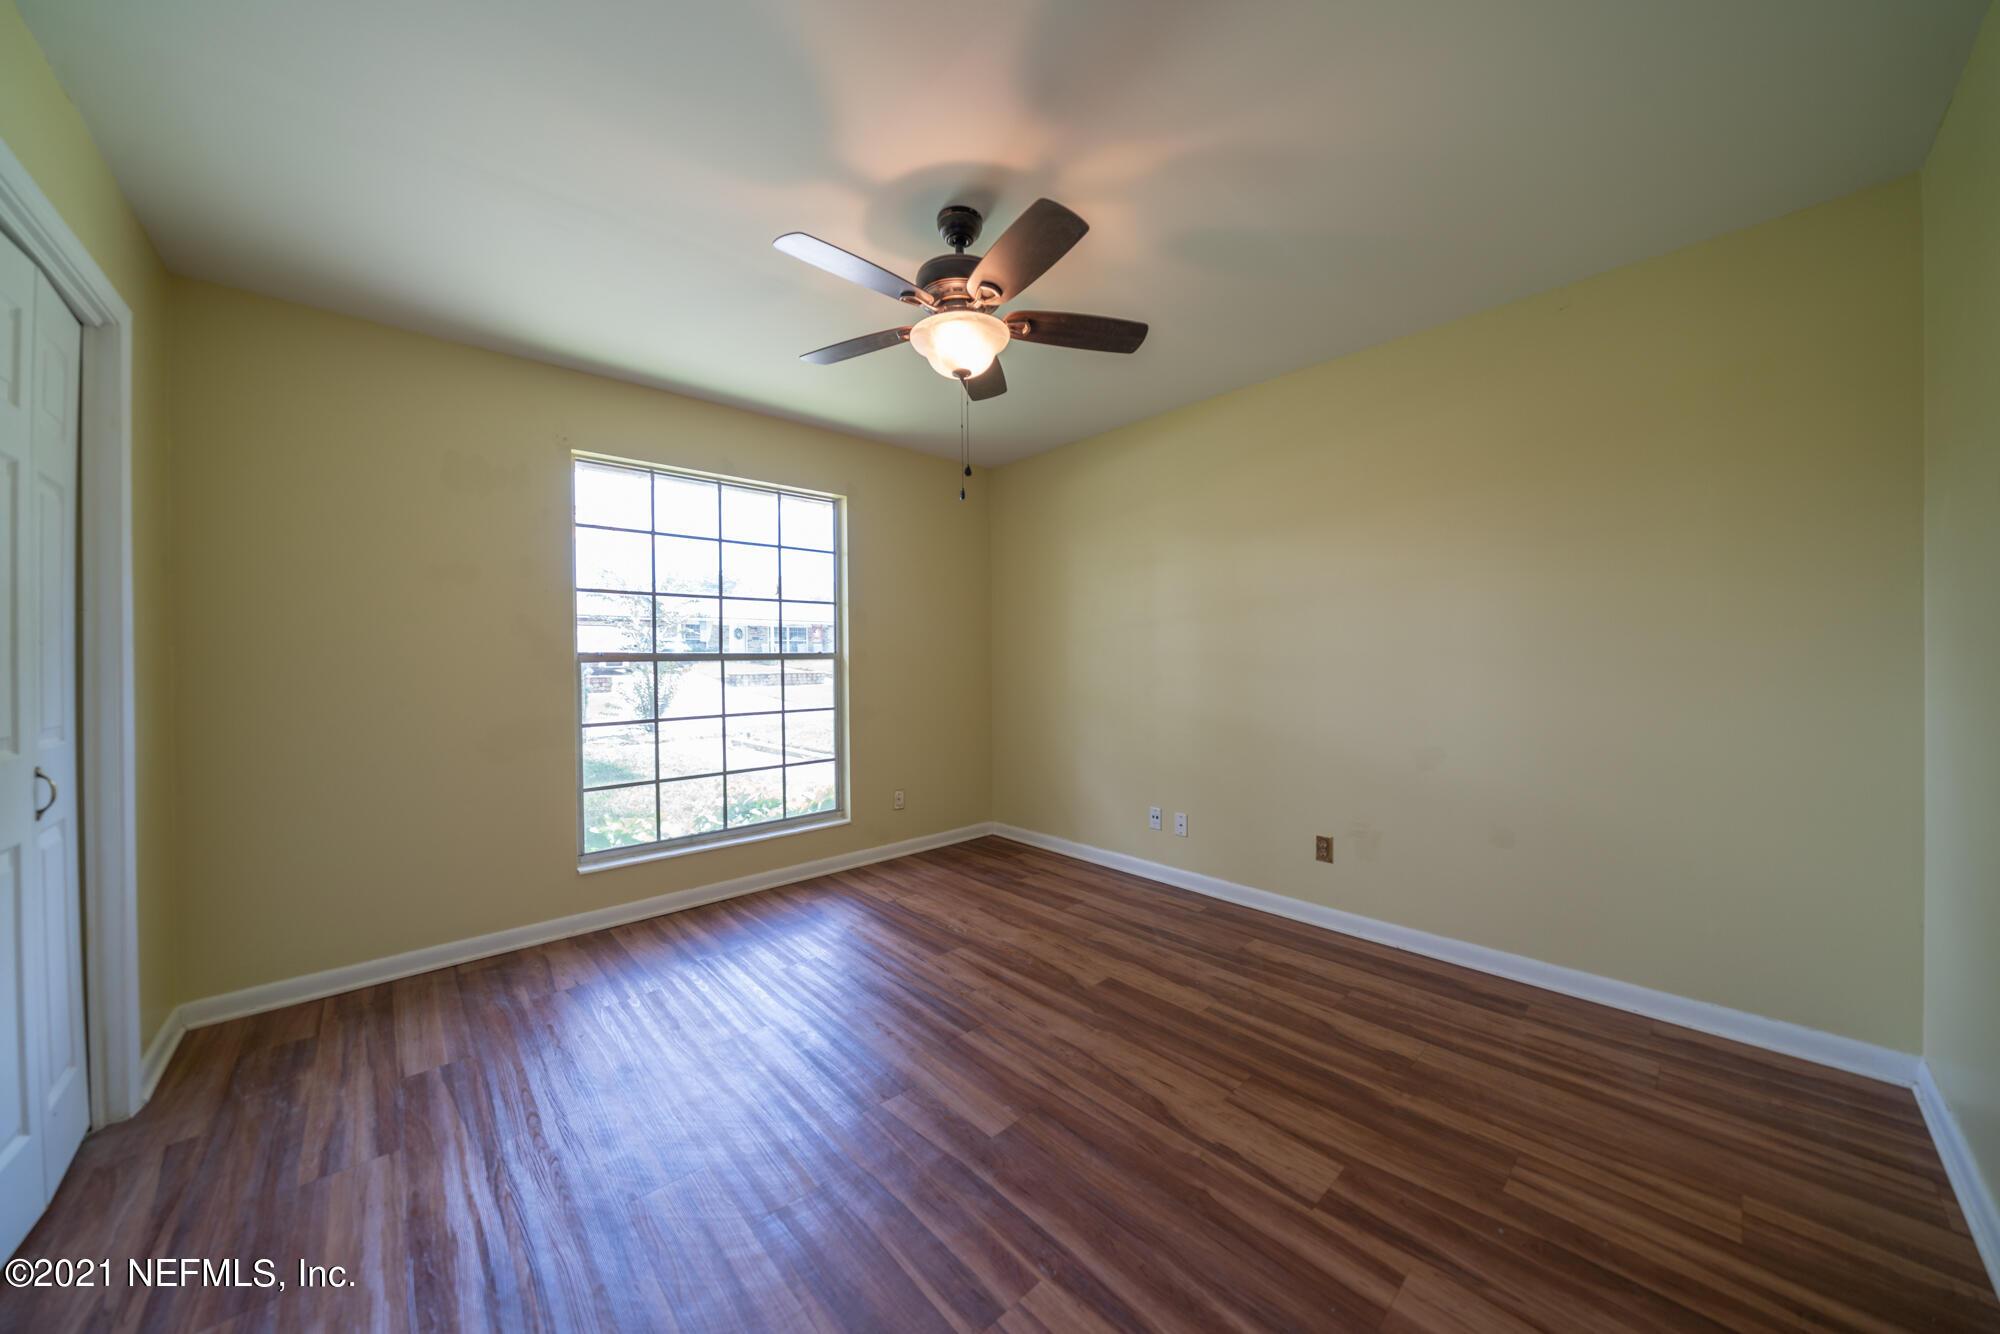 2834 HOLLYBAY, ORANGE PARK, FLORIDA 32073, 4 Bedrooms Bedrooms, ,2 BathroomsBathrooms,Residential,For sale,HOLLYBAY,1127568